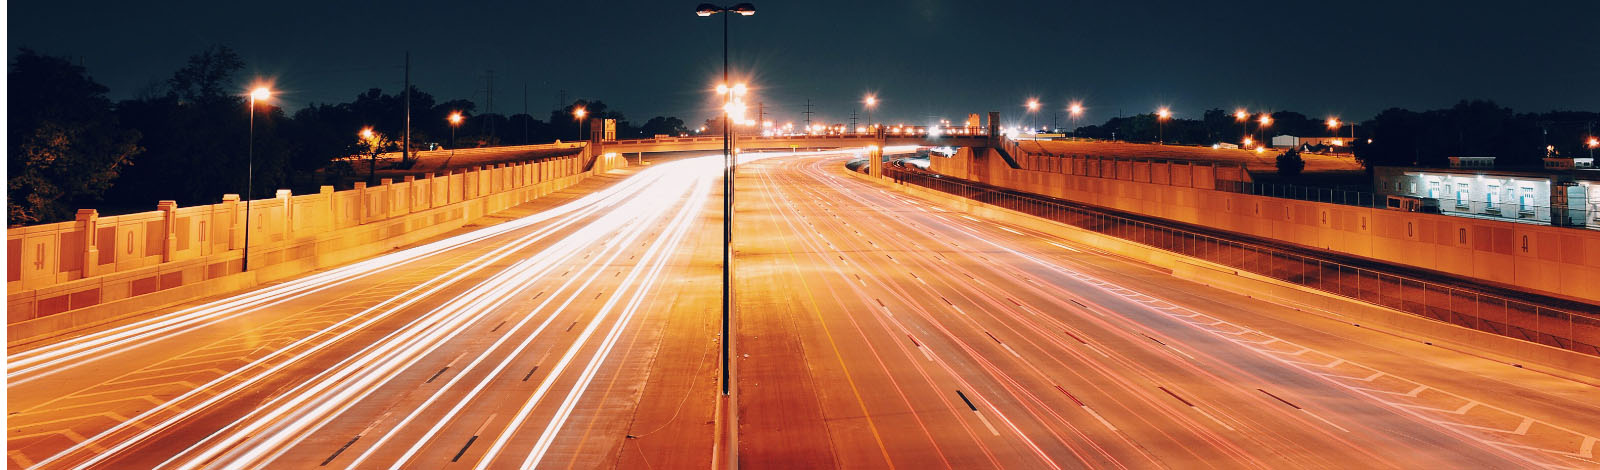 automotiverocket-search2